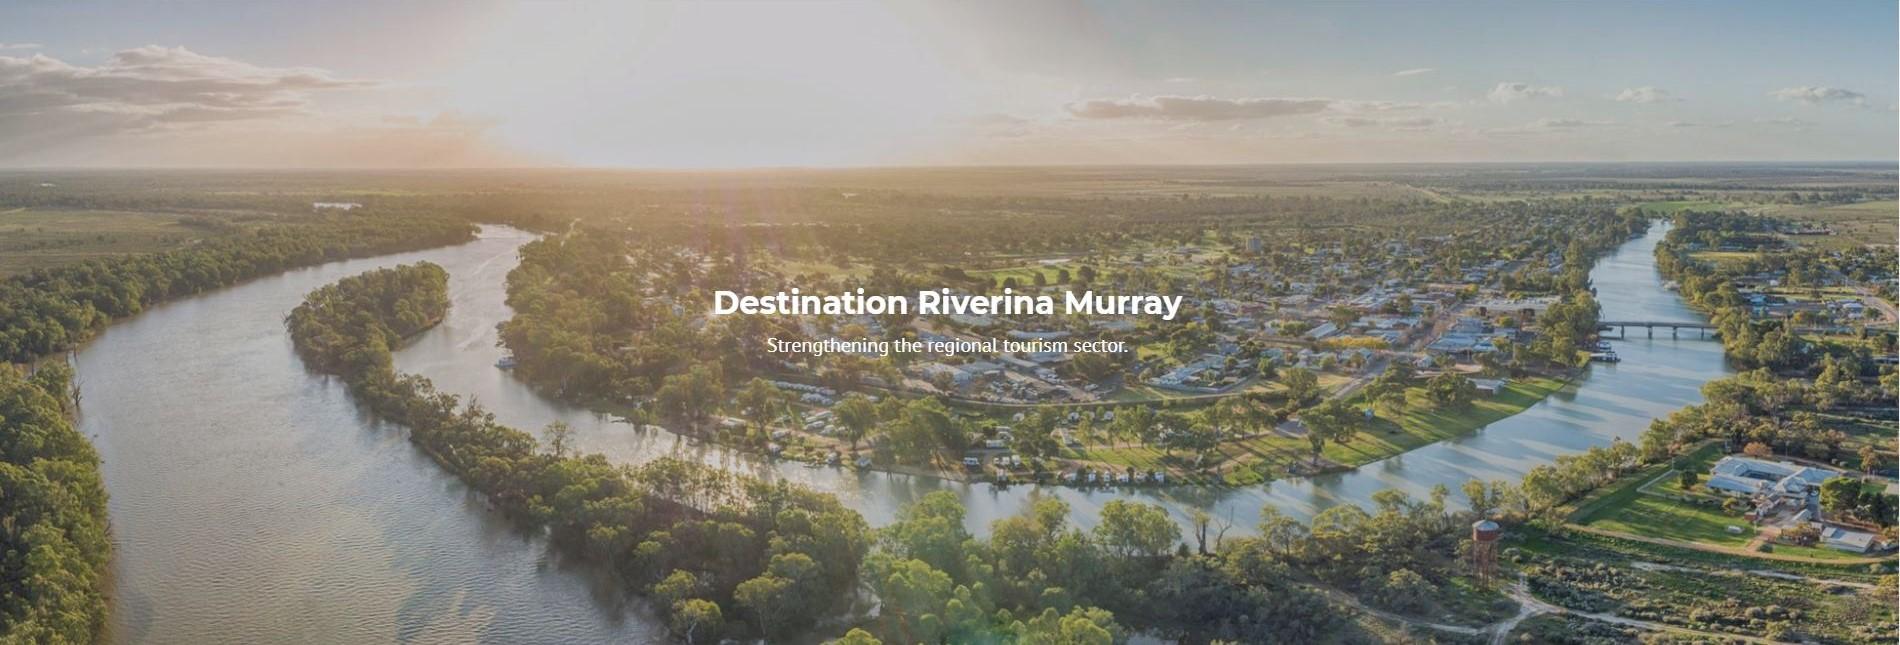 Destination Riverina Murray.JPG